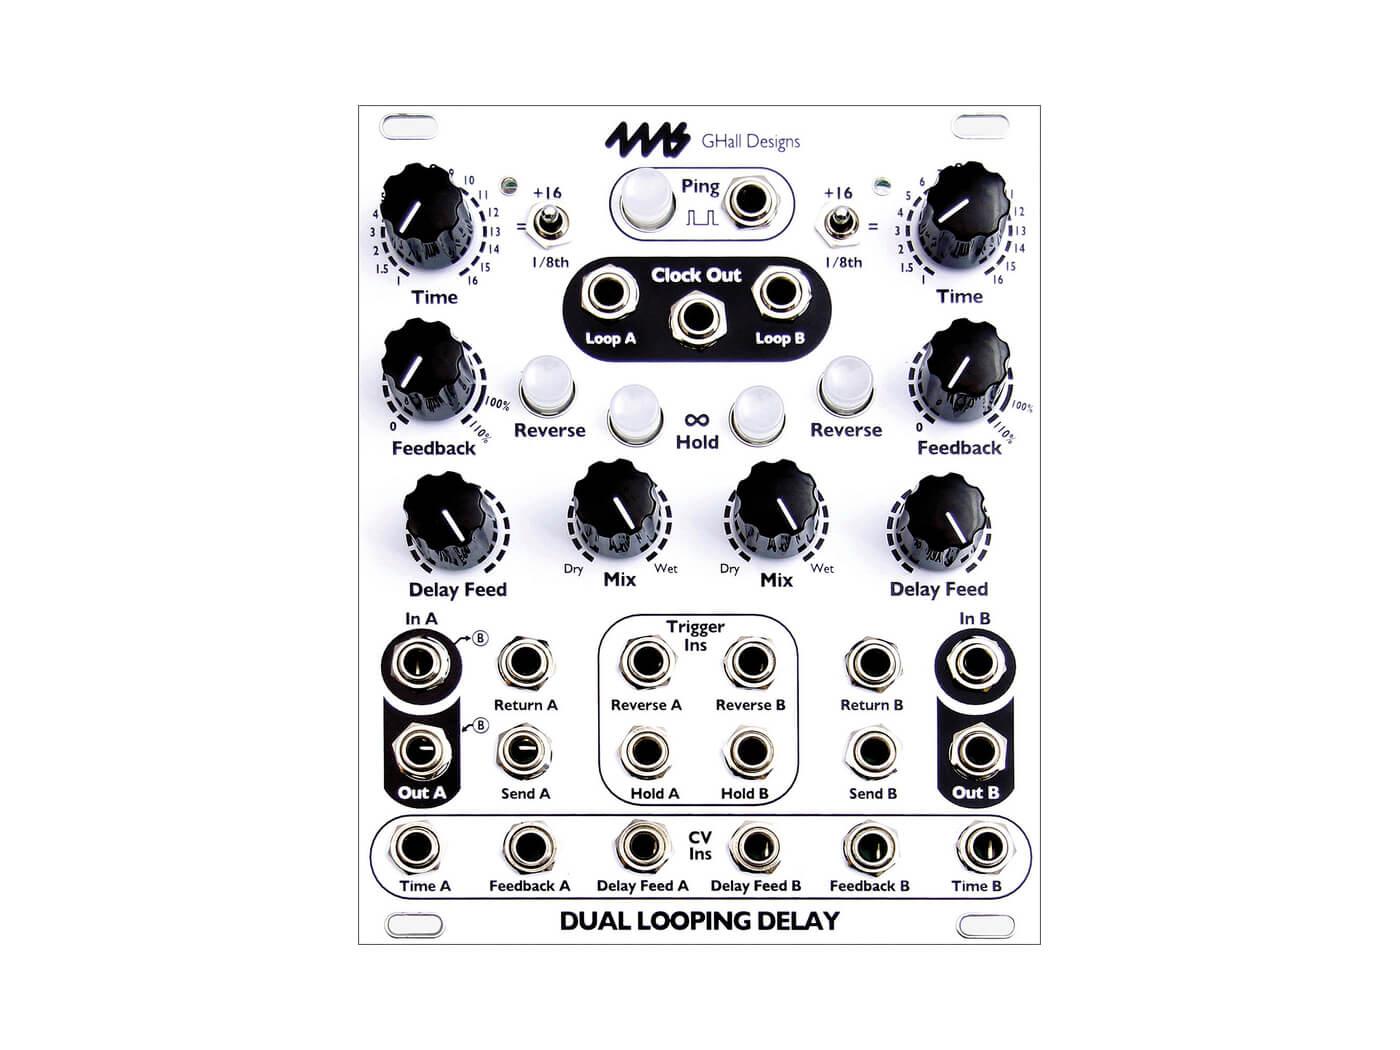 4MS Company Dual Looping delay